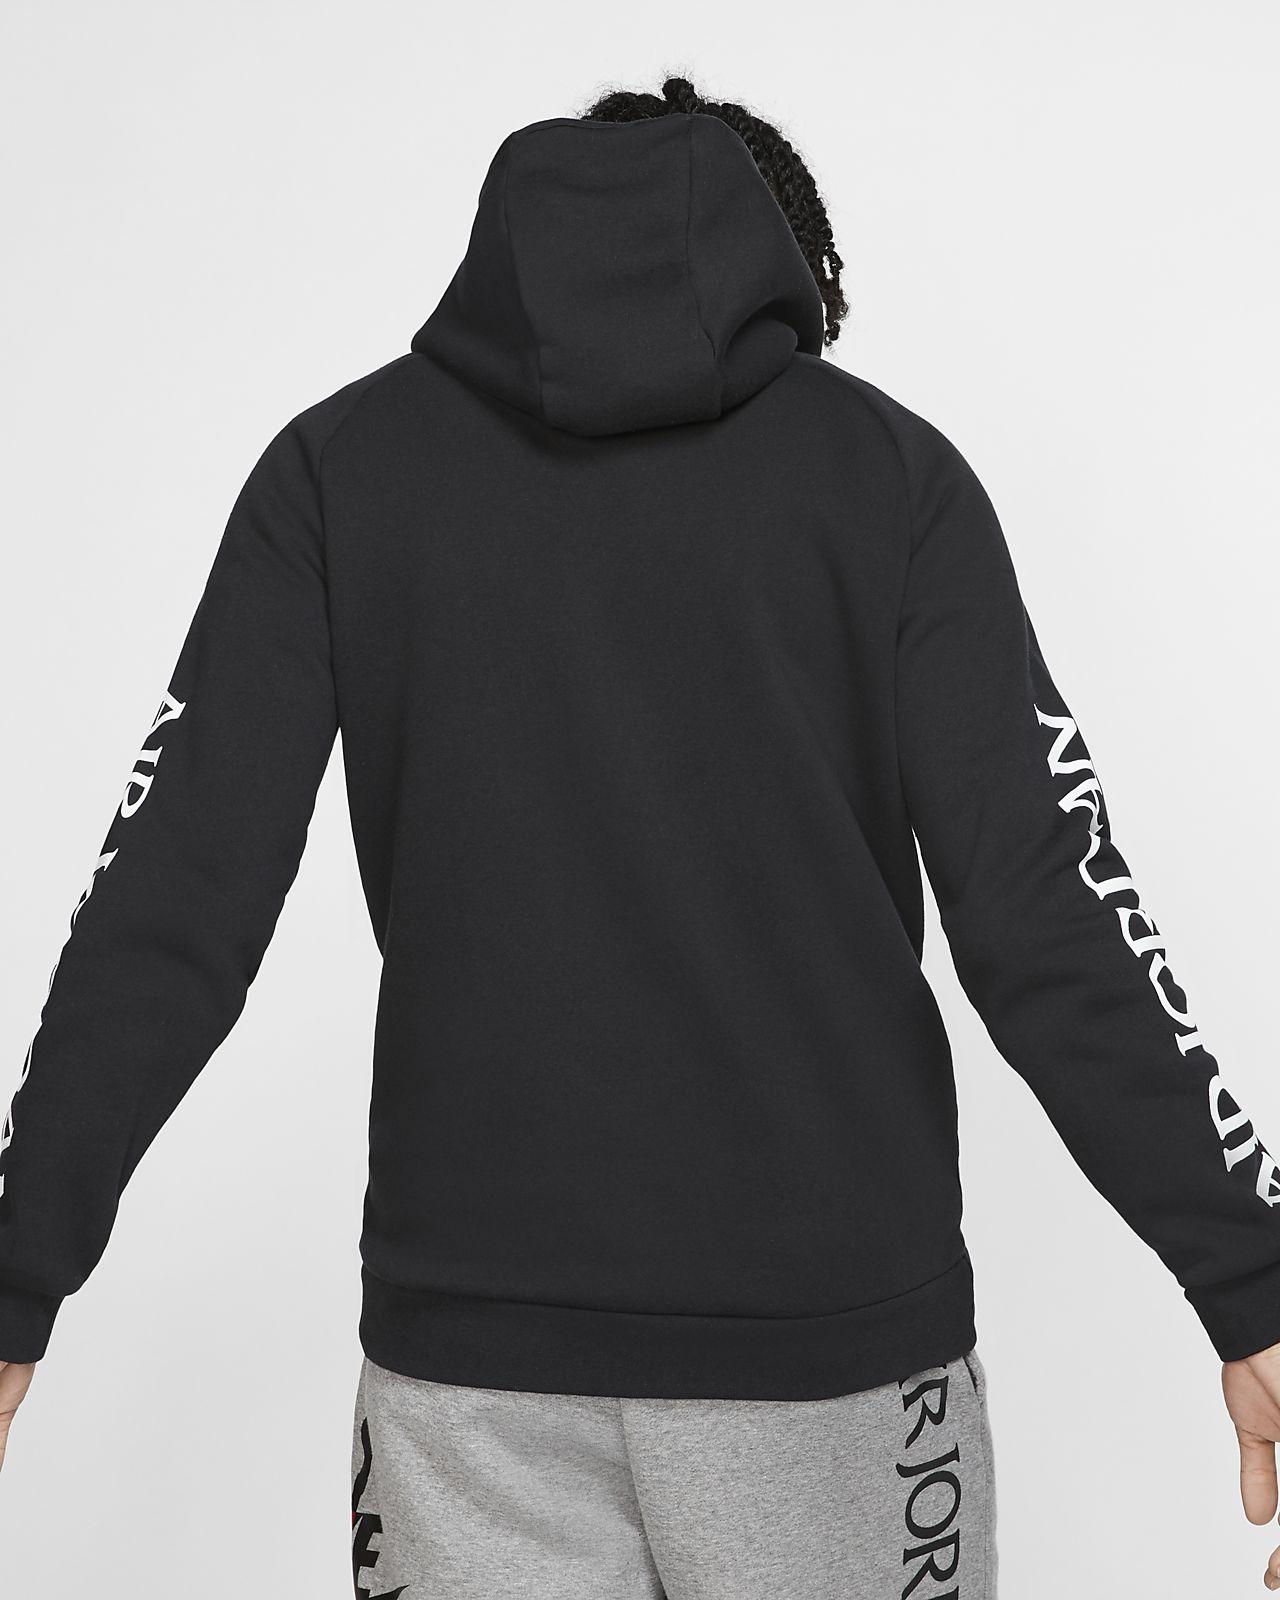 057233a9f9 Jordan Jumpman Classics Fleece Pullover Hoodie